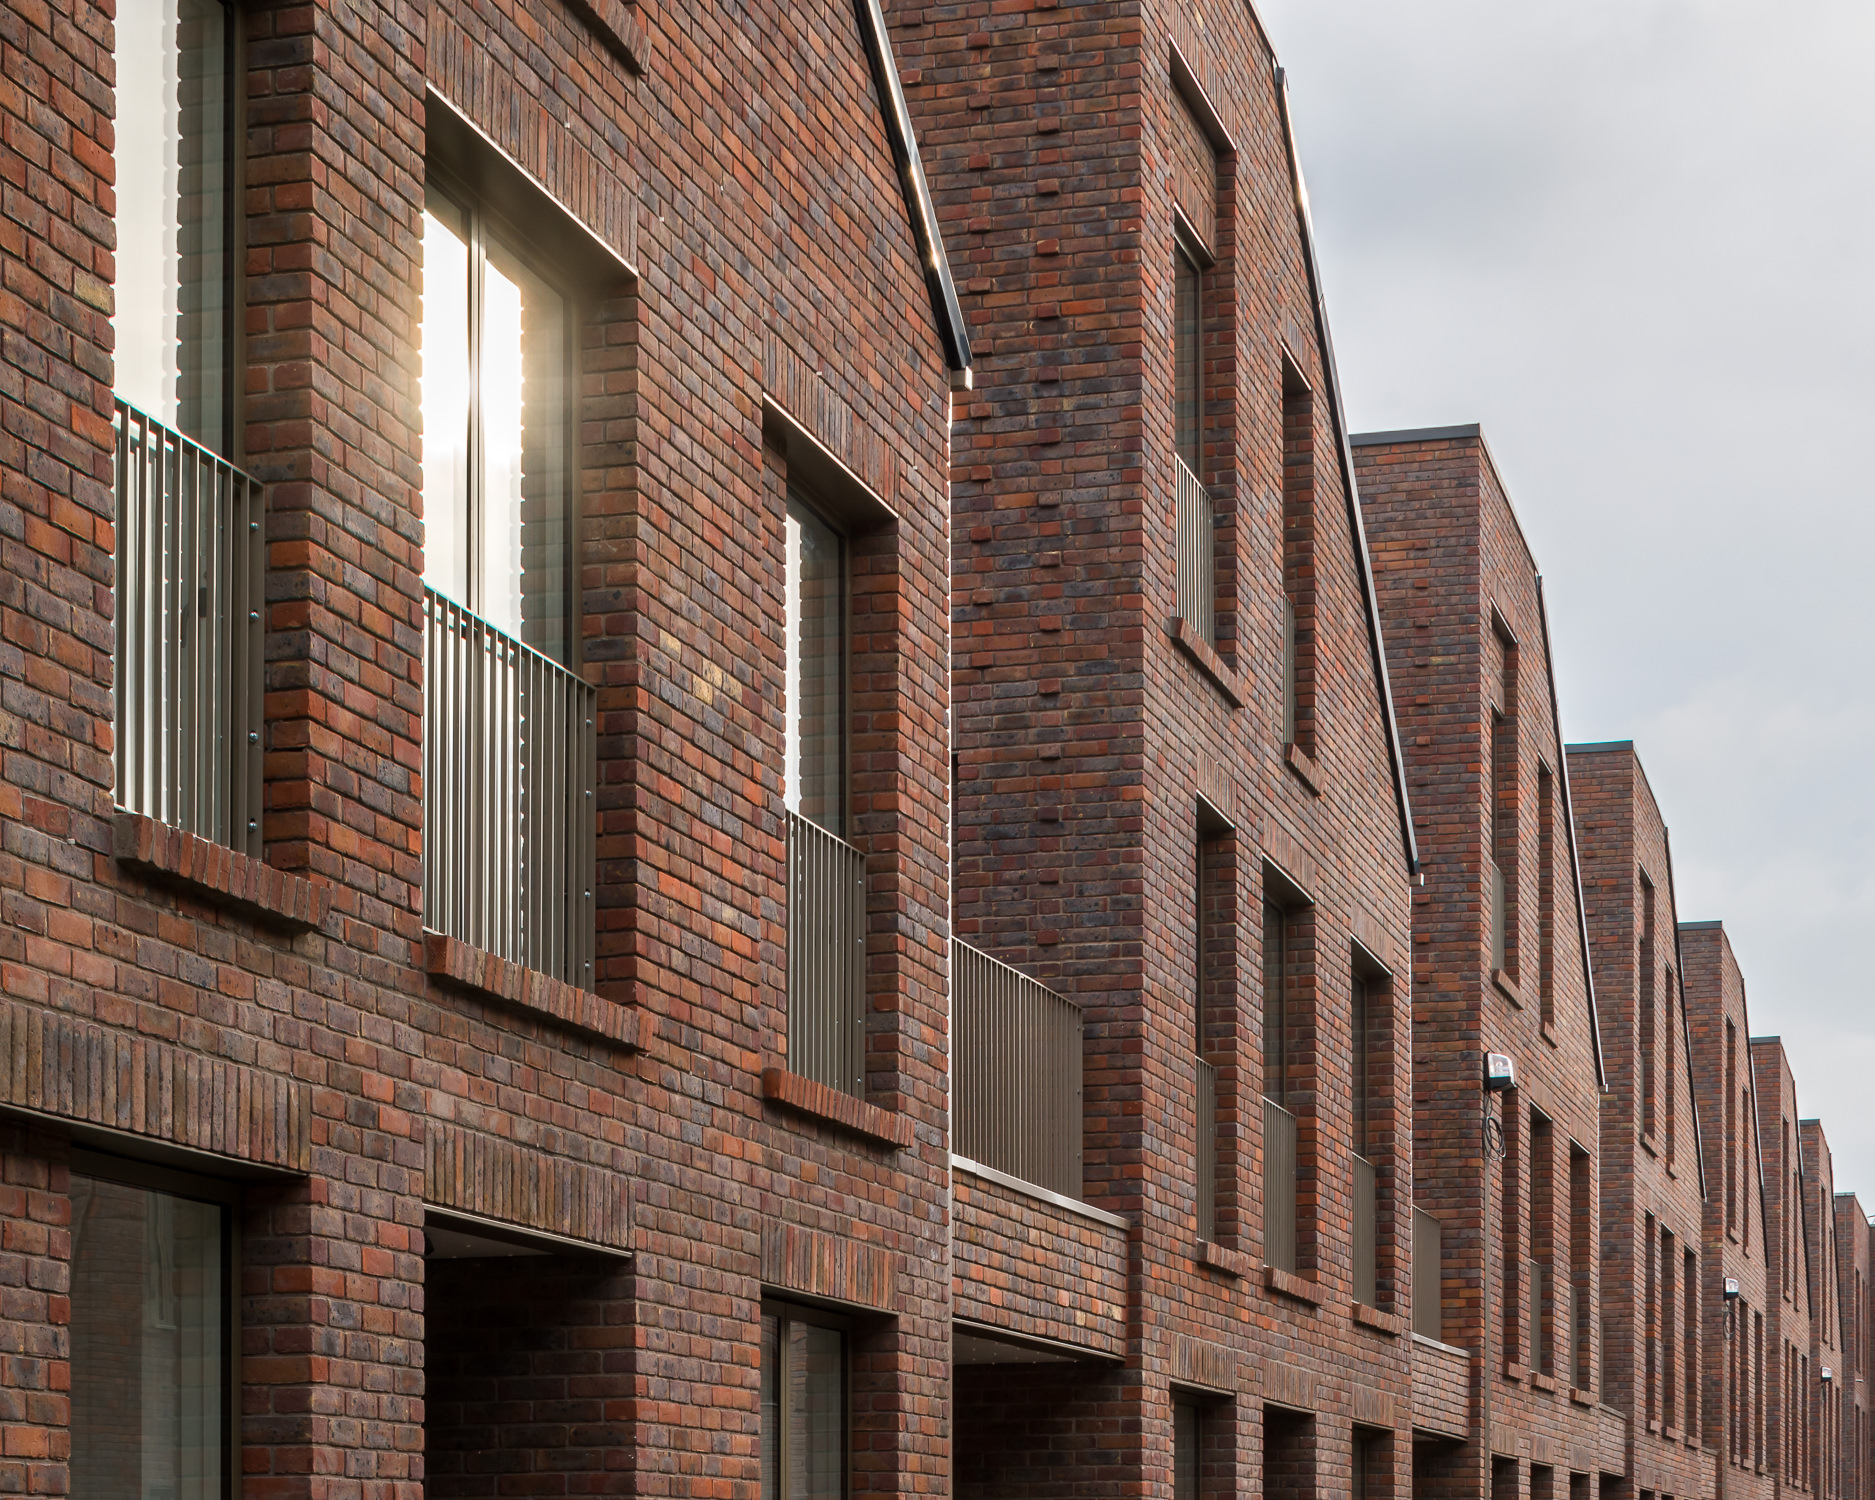 mark-hadden-architecture-photographer-architectuur-interieur-fotografie-london-amsterdam-Dujardin Mews-008.jpg